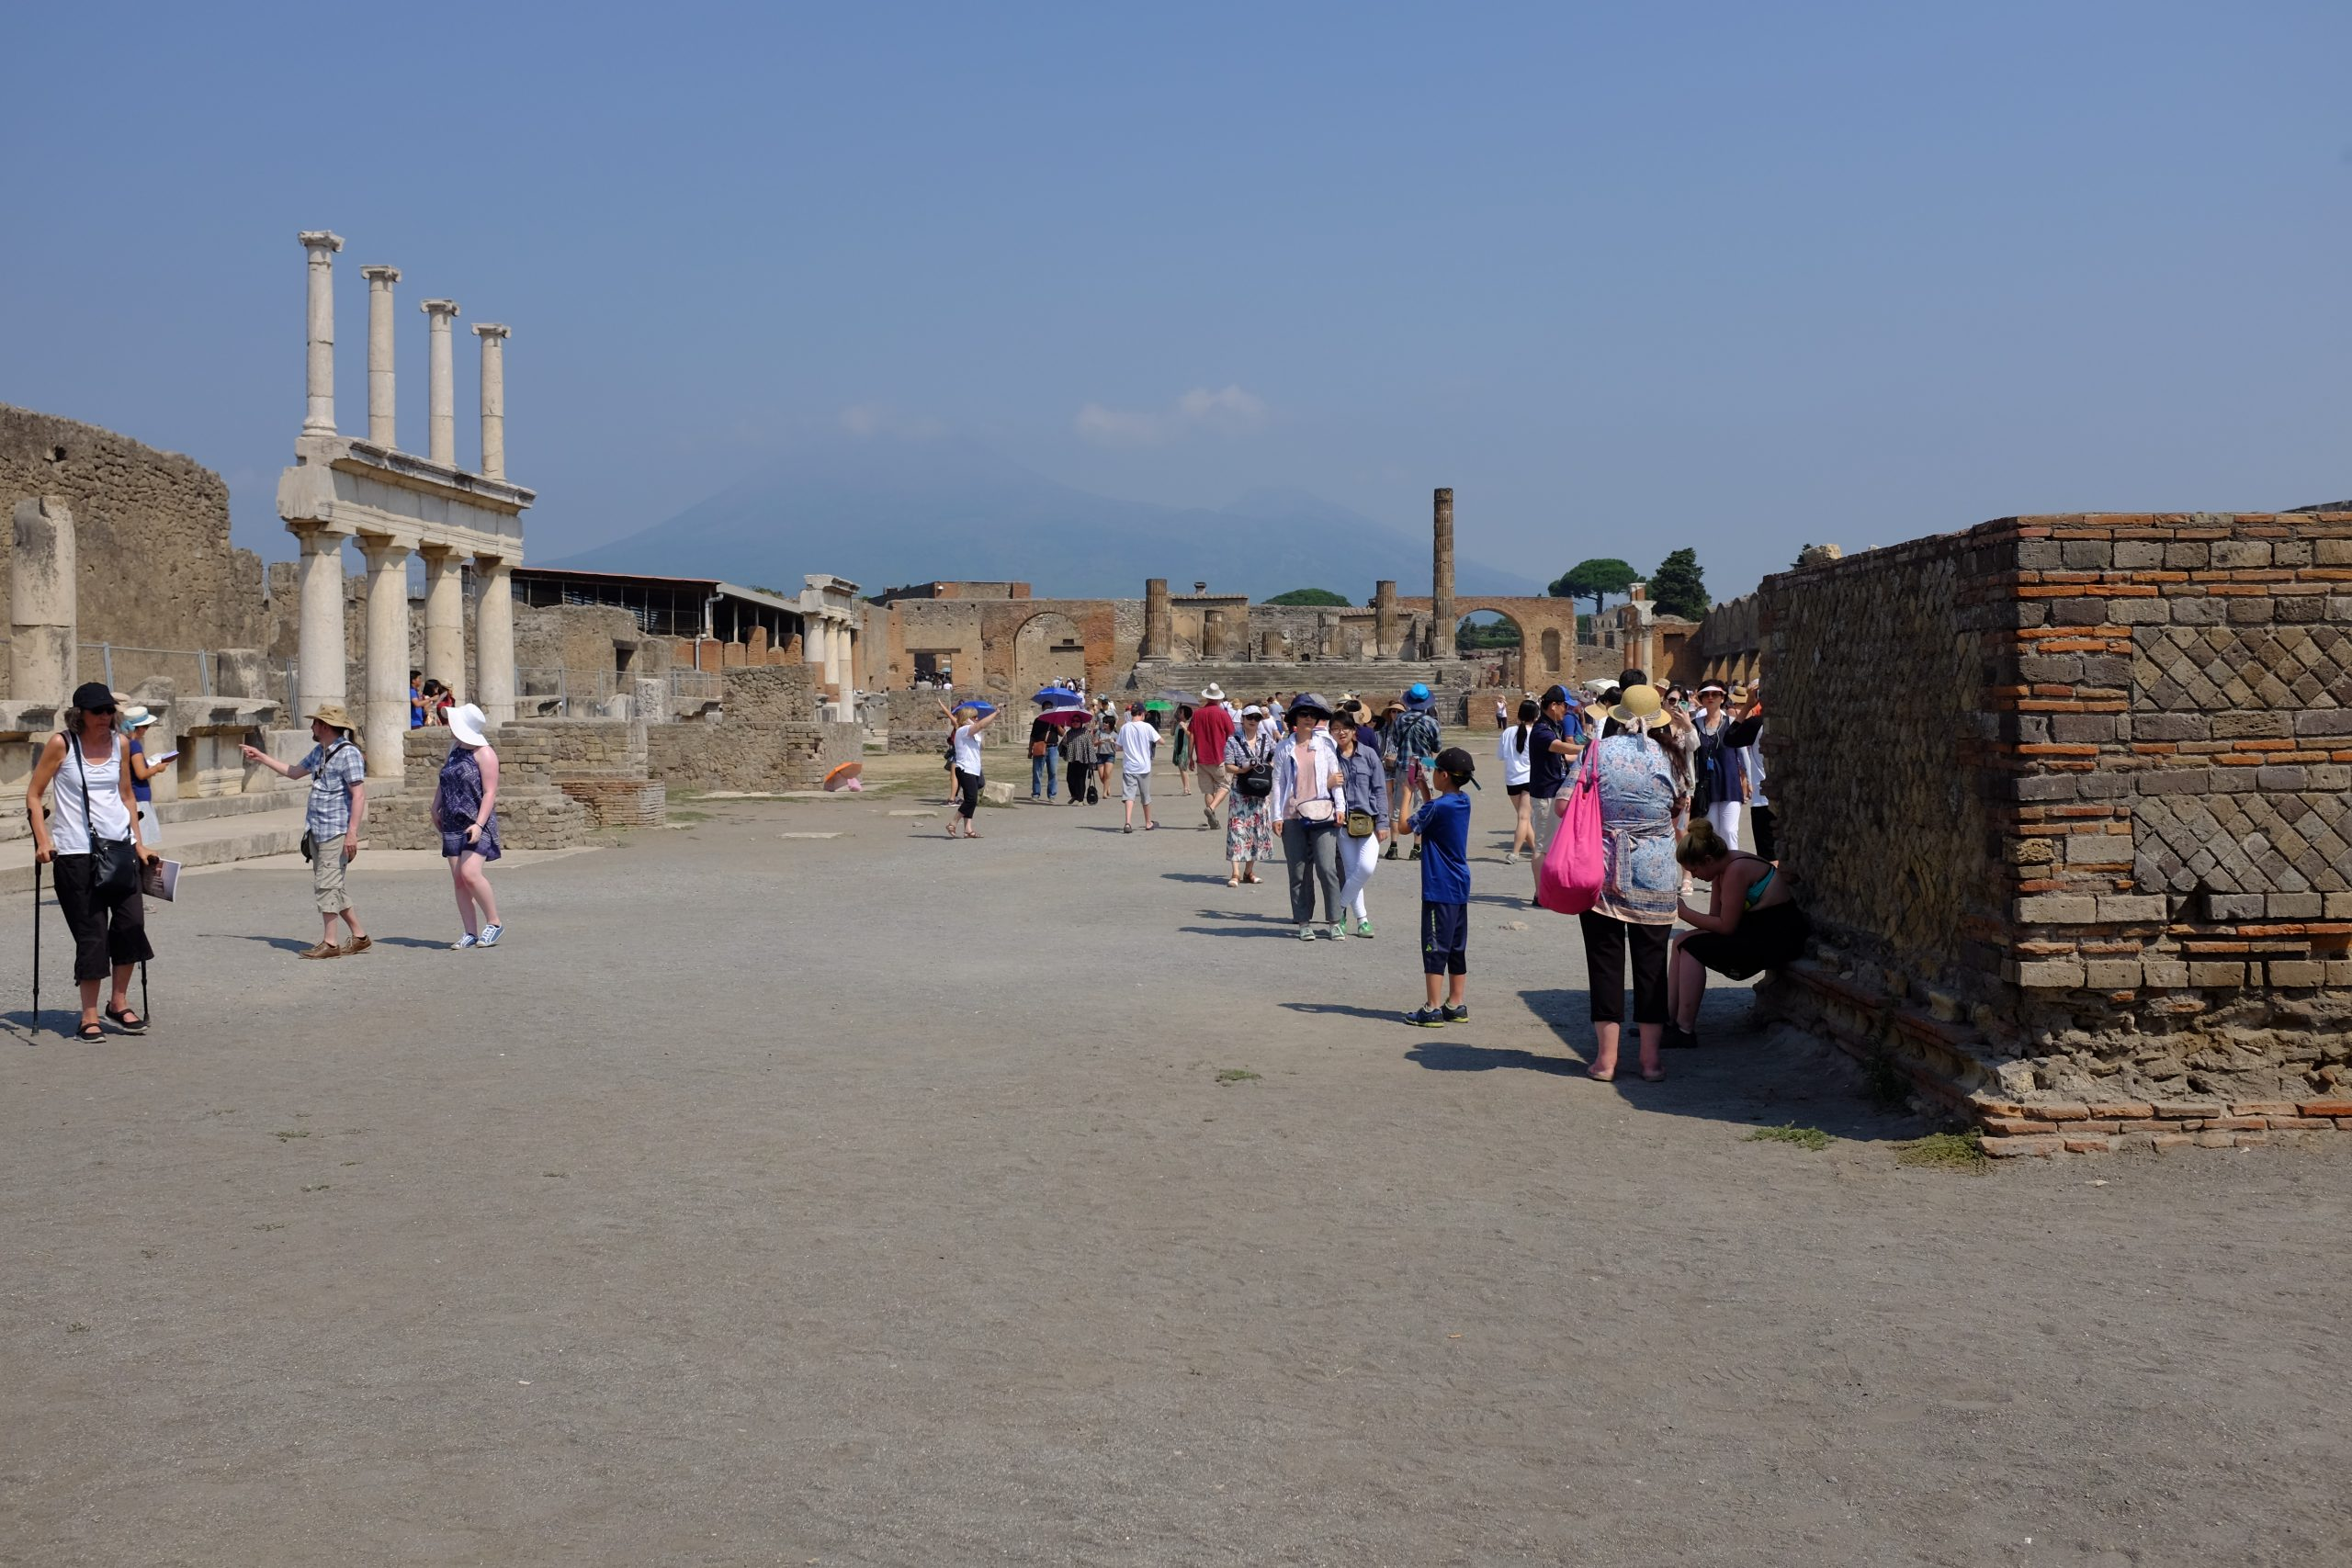 the Pompeii forum